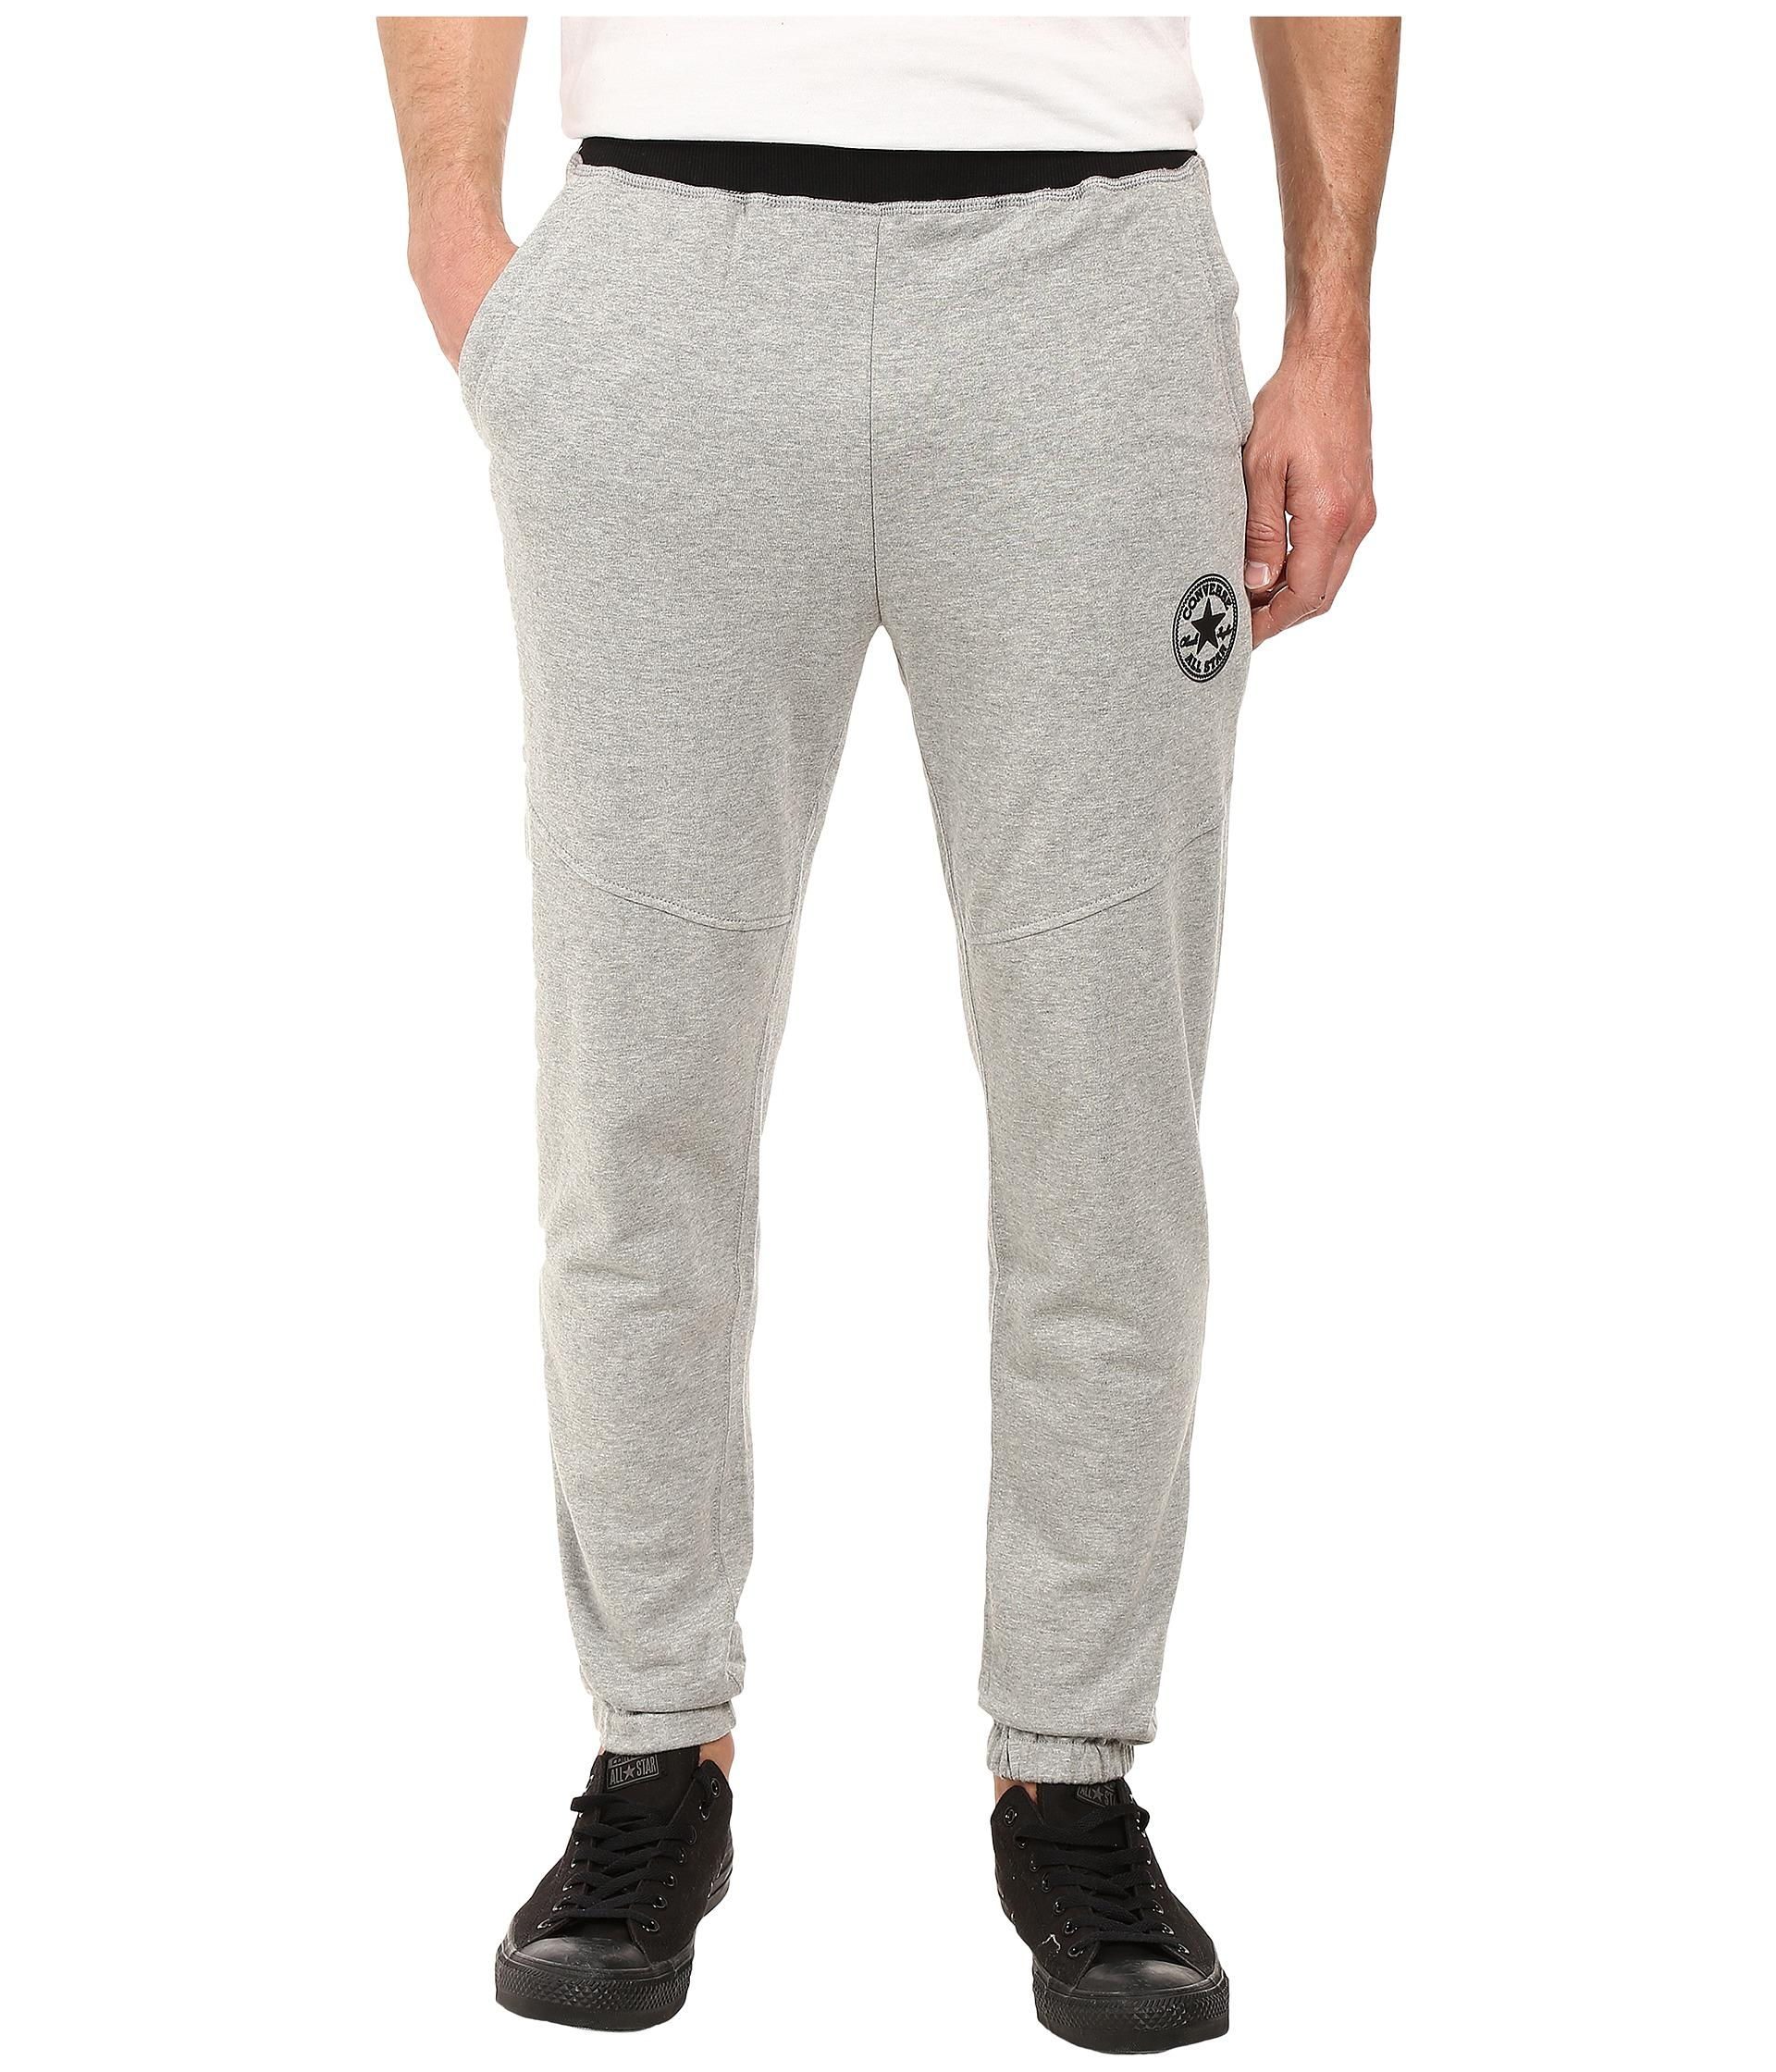 e439de8c0503 Lyst - Converse Color Block Jogger Pants in Gray for Men